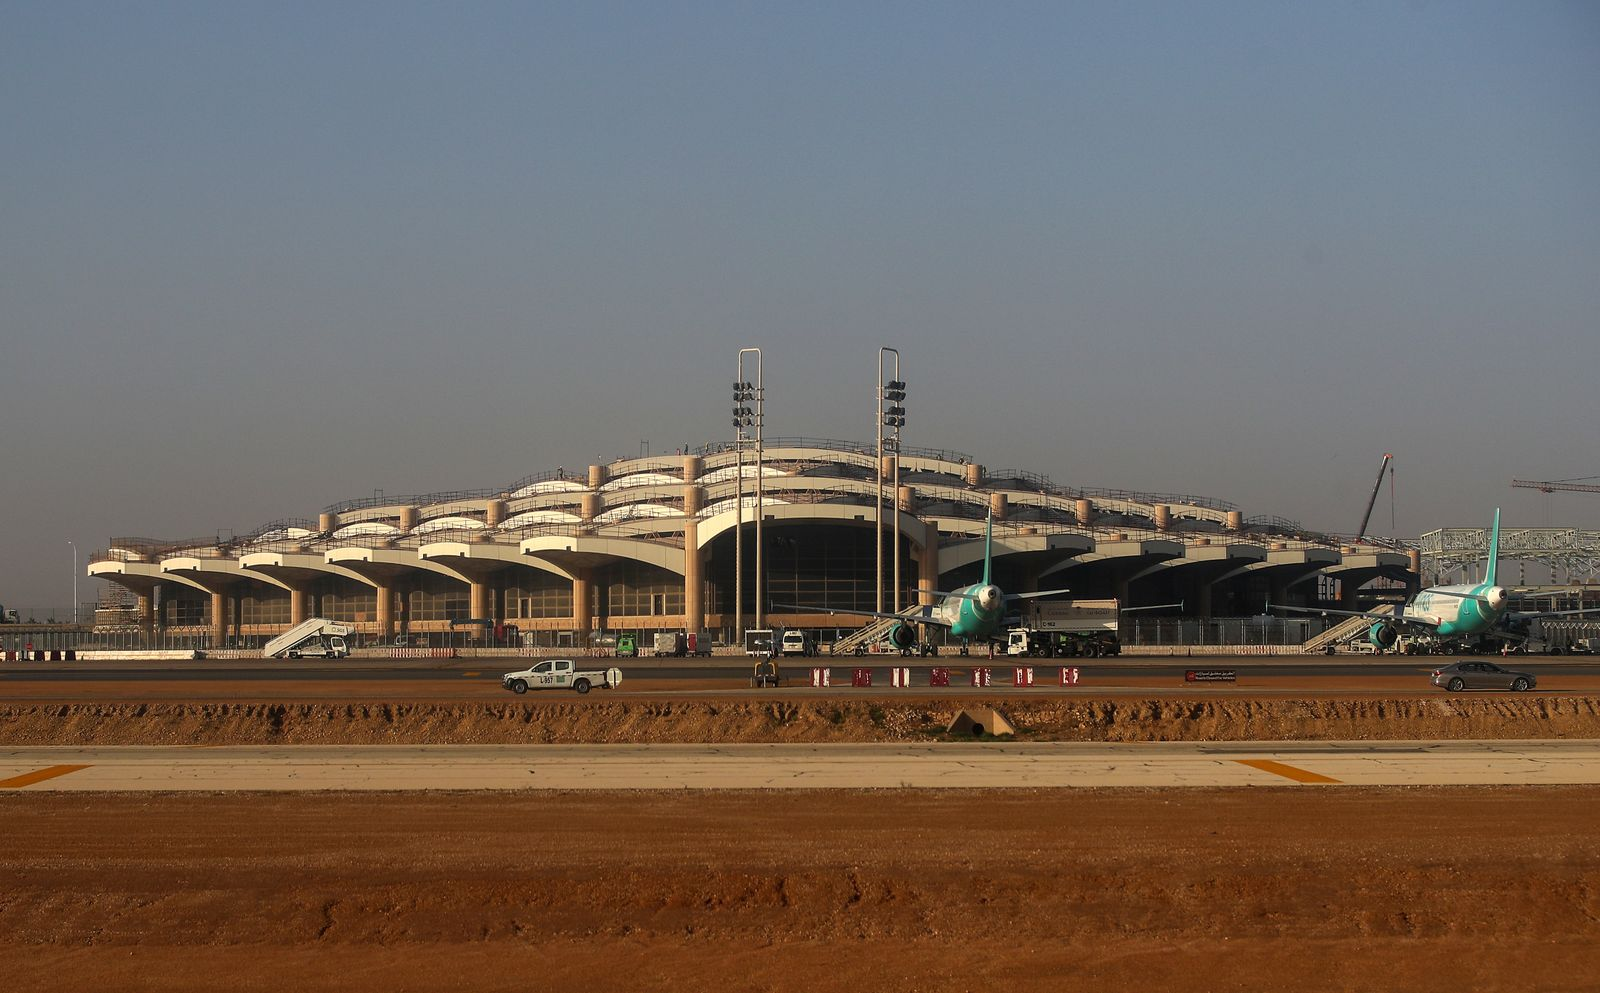 RIYADH, SAUDI ARABIA - DECEMBER 8, 2019: King Khalid International Airport. Valery Sharifulin/TASS PUBLICATIONxINxGERxAU